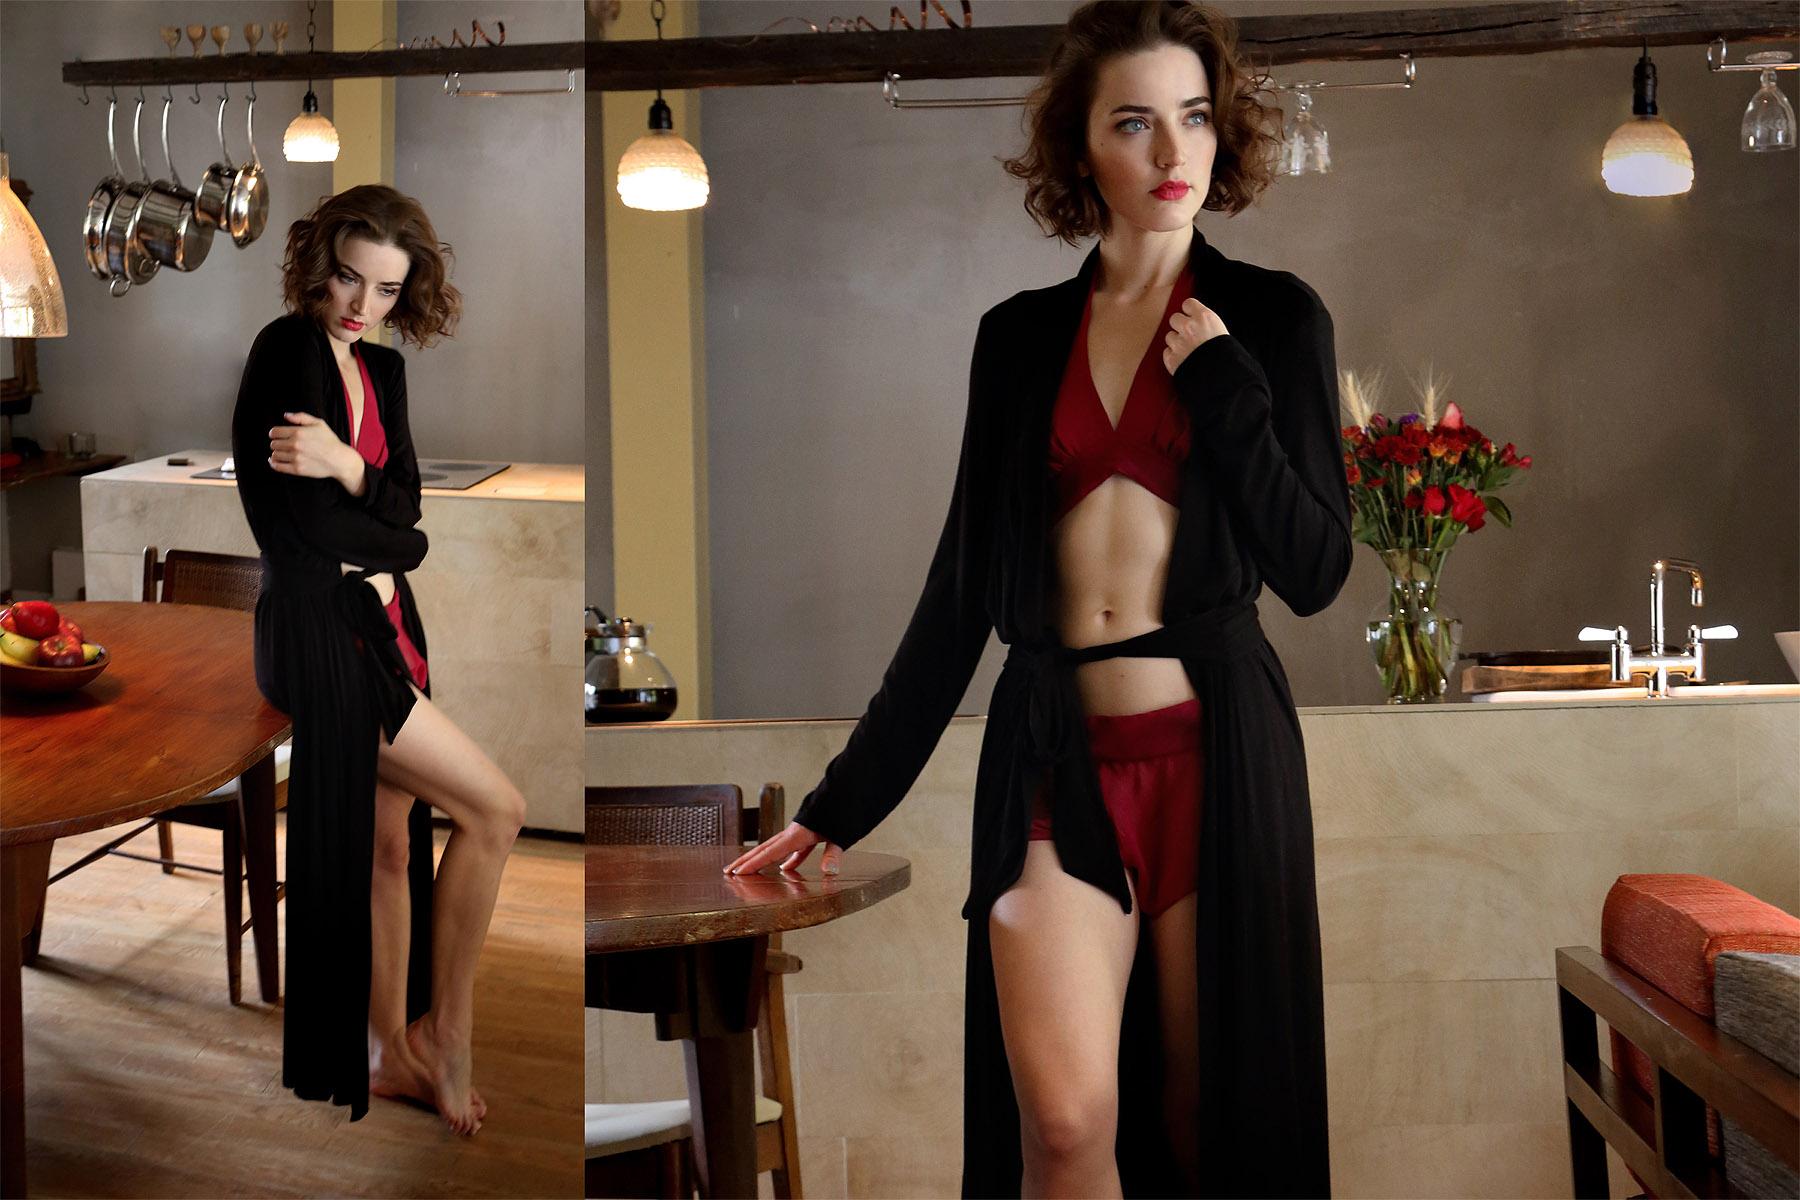 holiday-14-bts-lingerie-lookbook-black-long-robe-red-sheer-romance-bra-panty-cabin-2.jpg